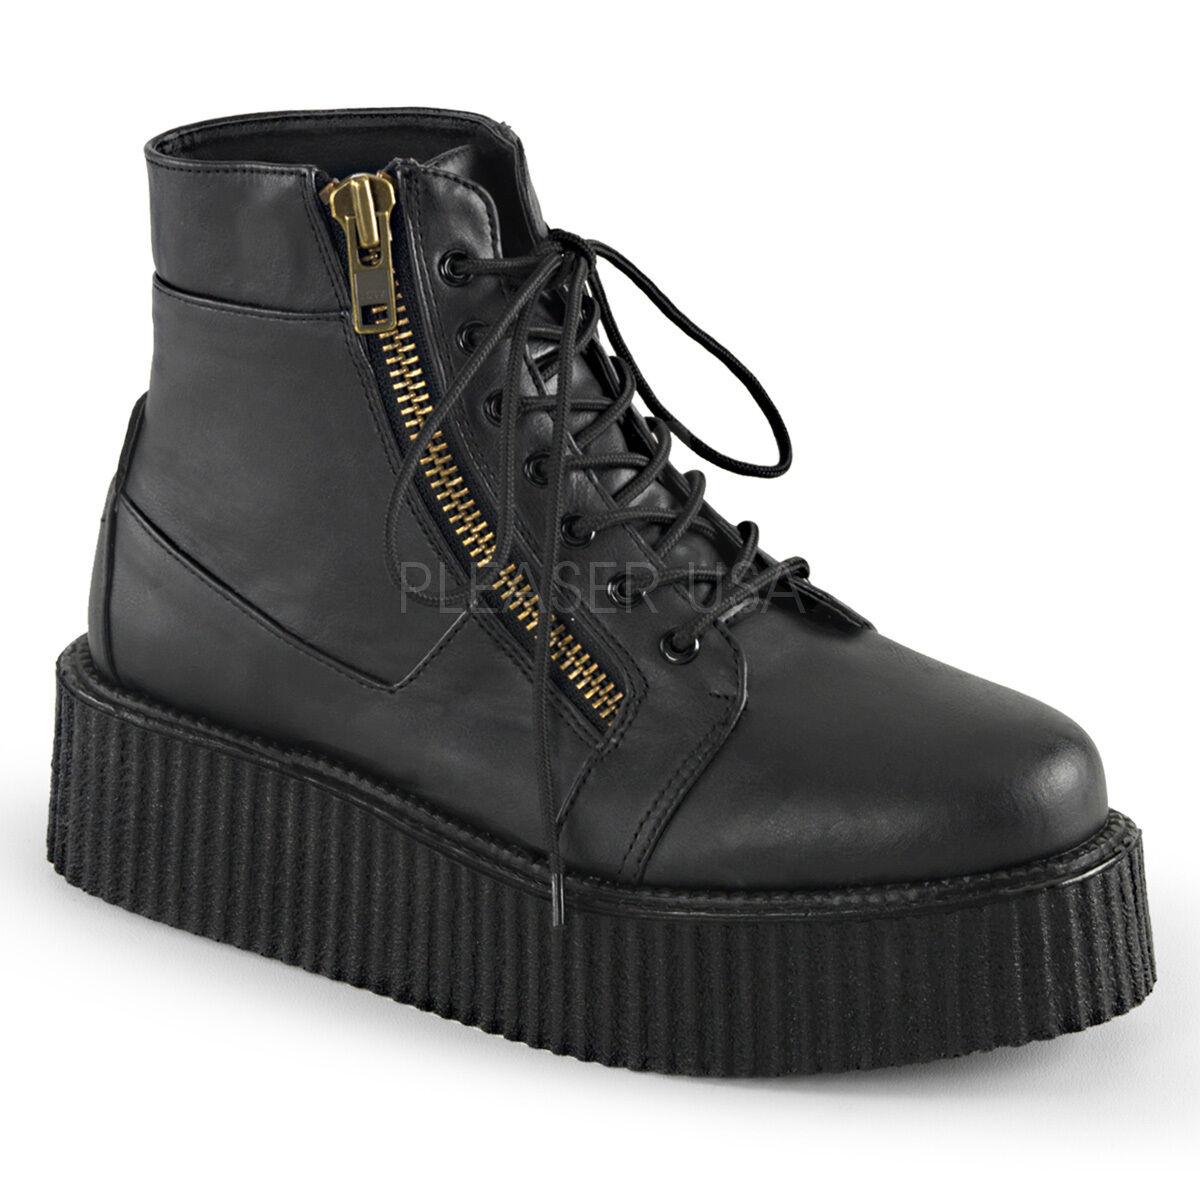 New Demonia 2  Vegan Platform Exposed Zipper Creeper Boots Goth Punk Men's 4-13